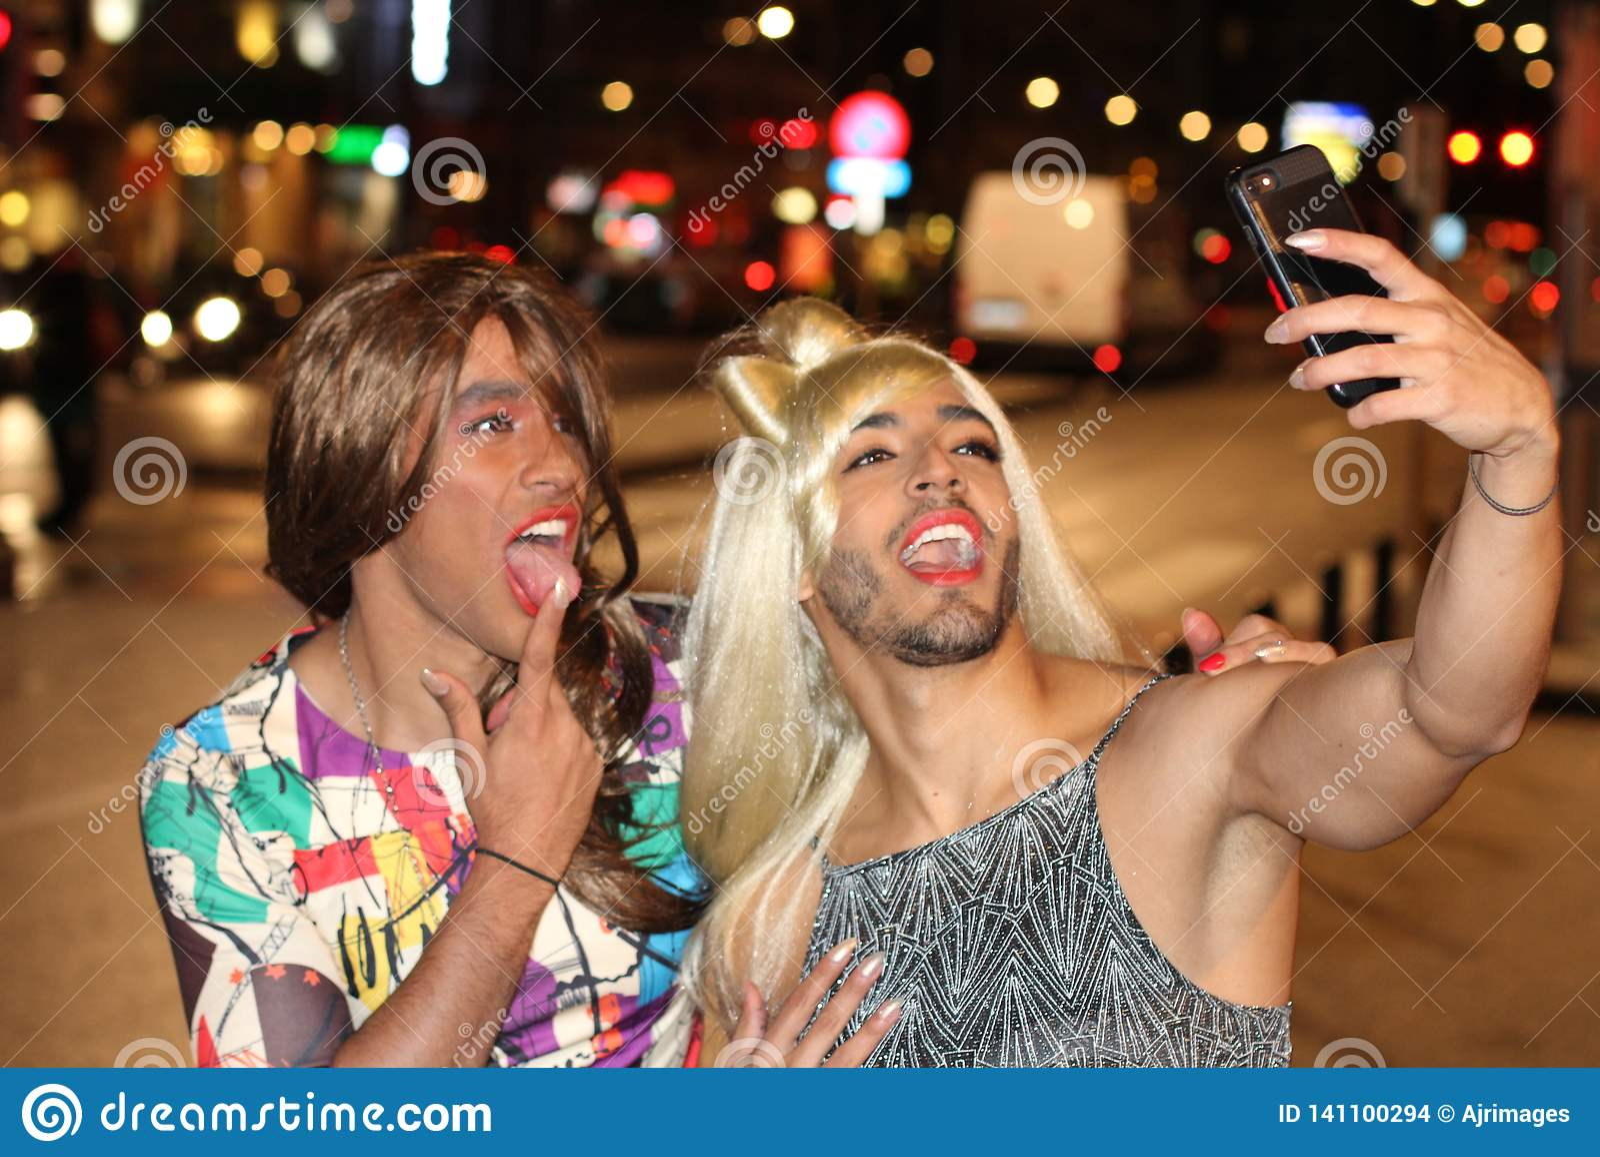 Pictures of transvestites